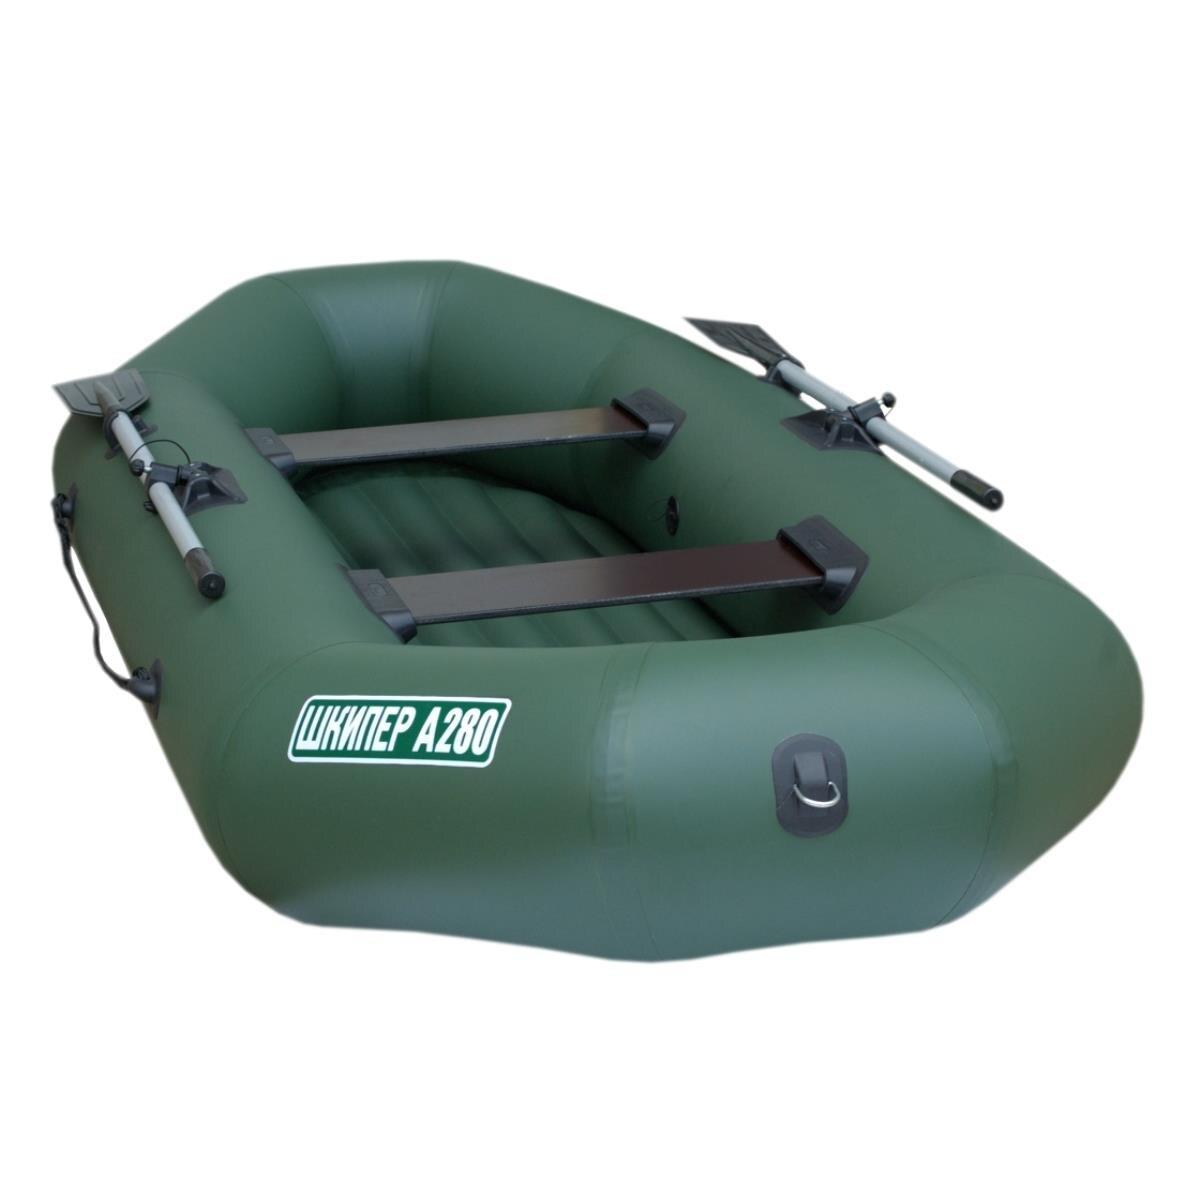 Boat Skipper А280 (inflatable Bottom) (Green)